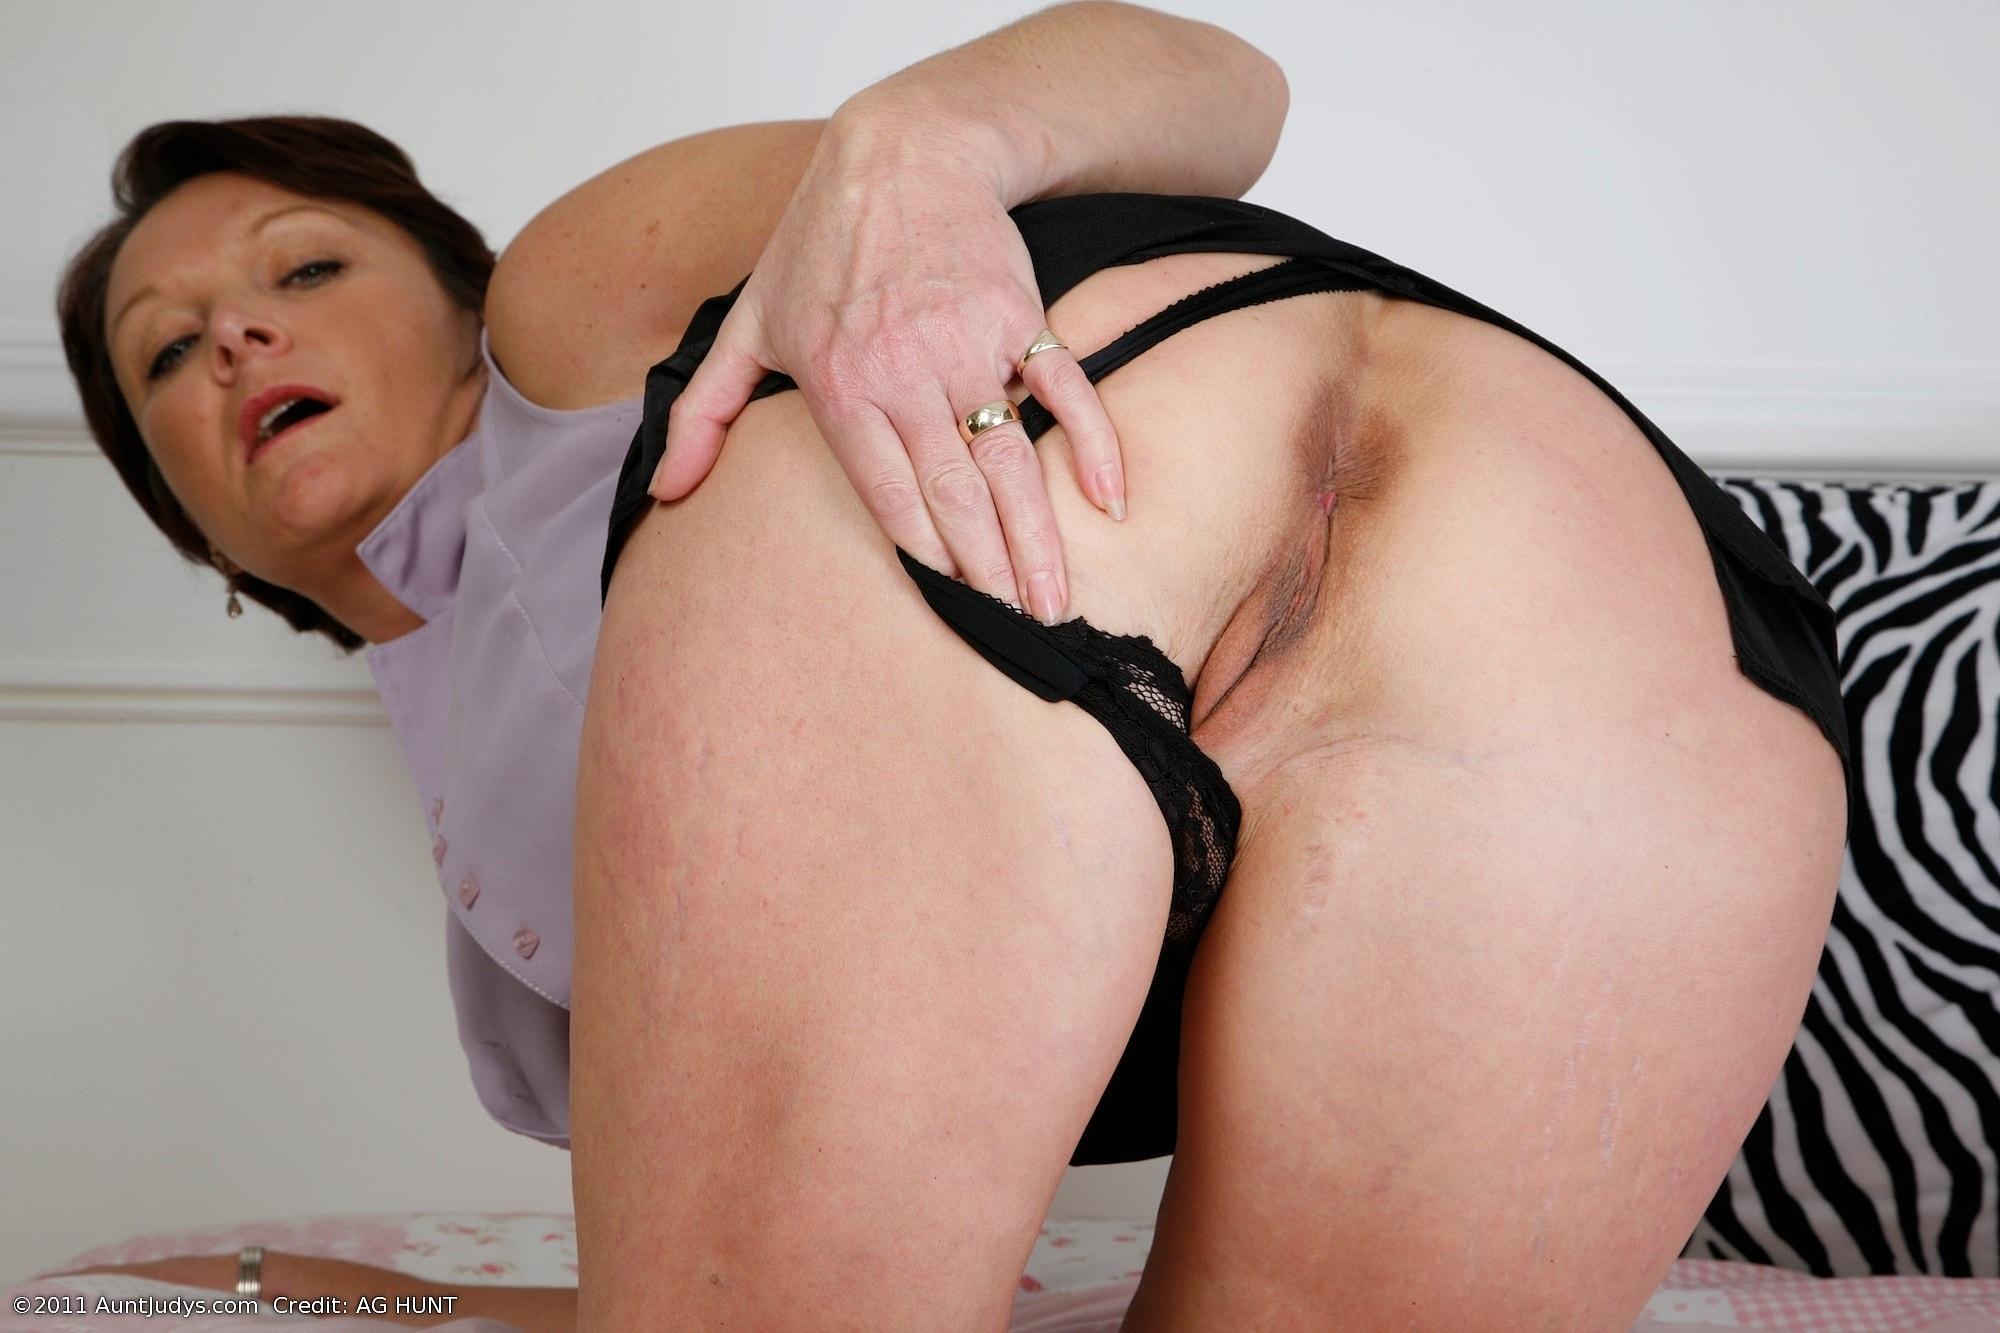 Aunt judys mature nudes discount